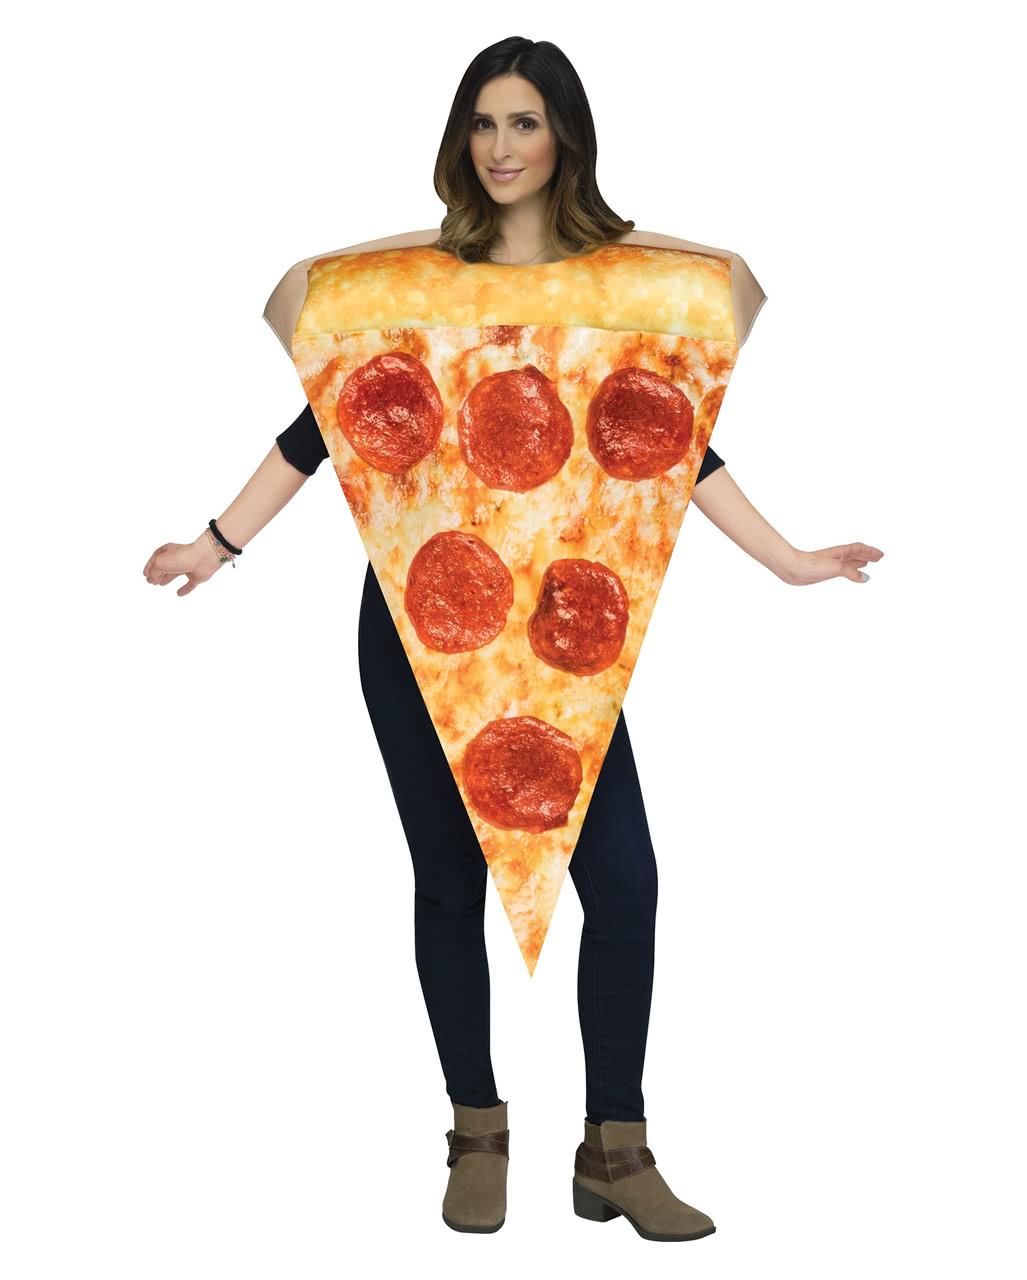 Unisex Pizza Costume Unisex Pizza Costume ...  sc 1 st  Horror-Shop.com & Unisex Pizza Costume For carnival | horror-shop.com